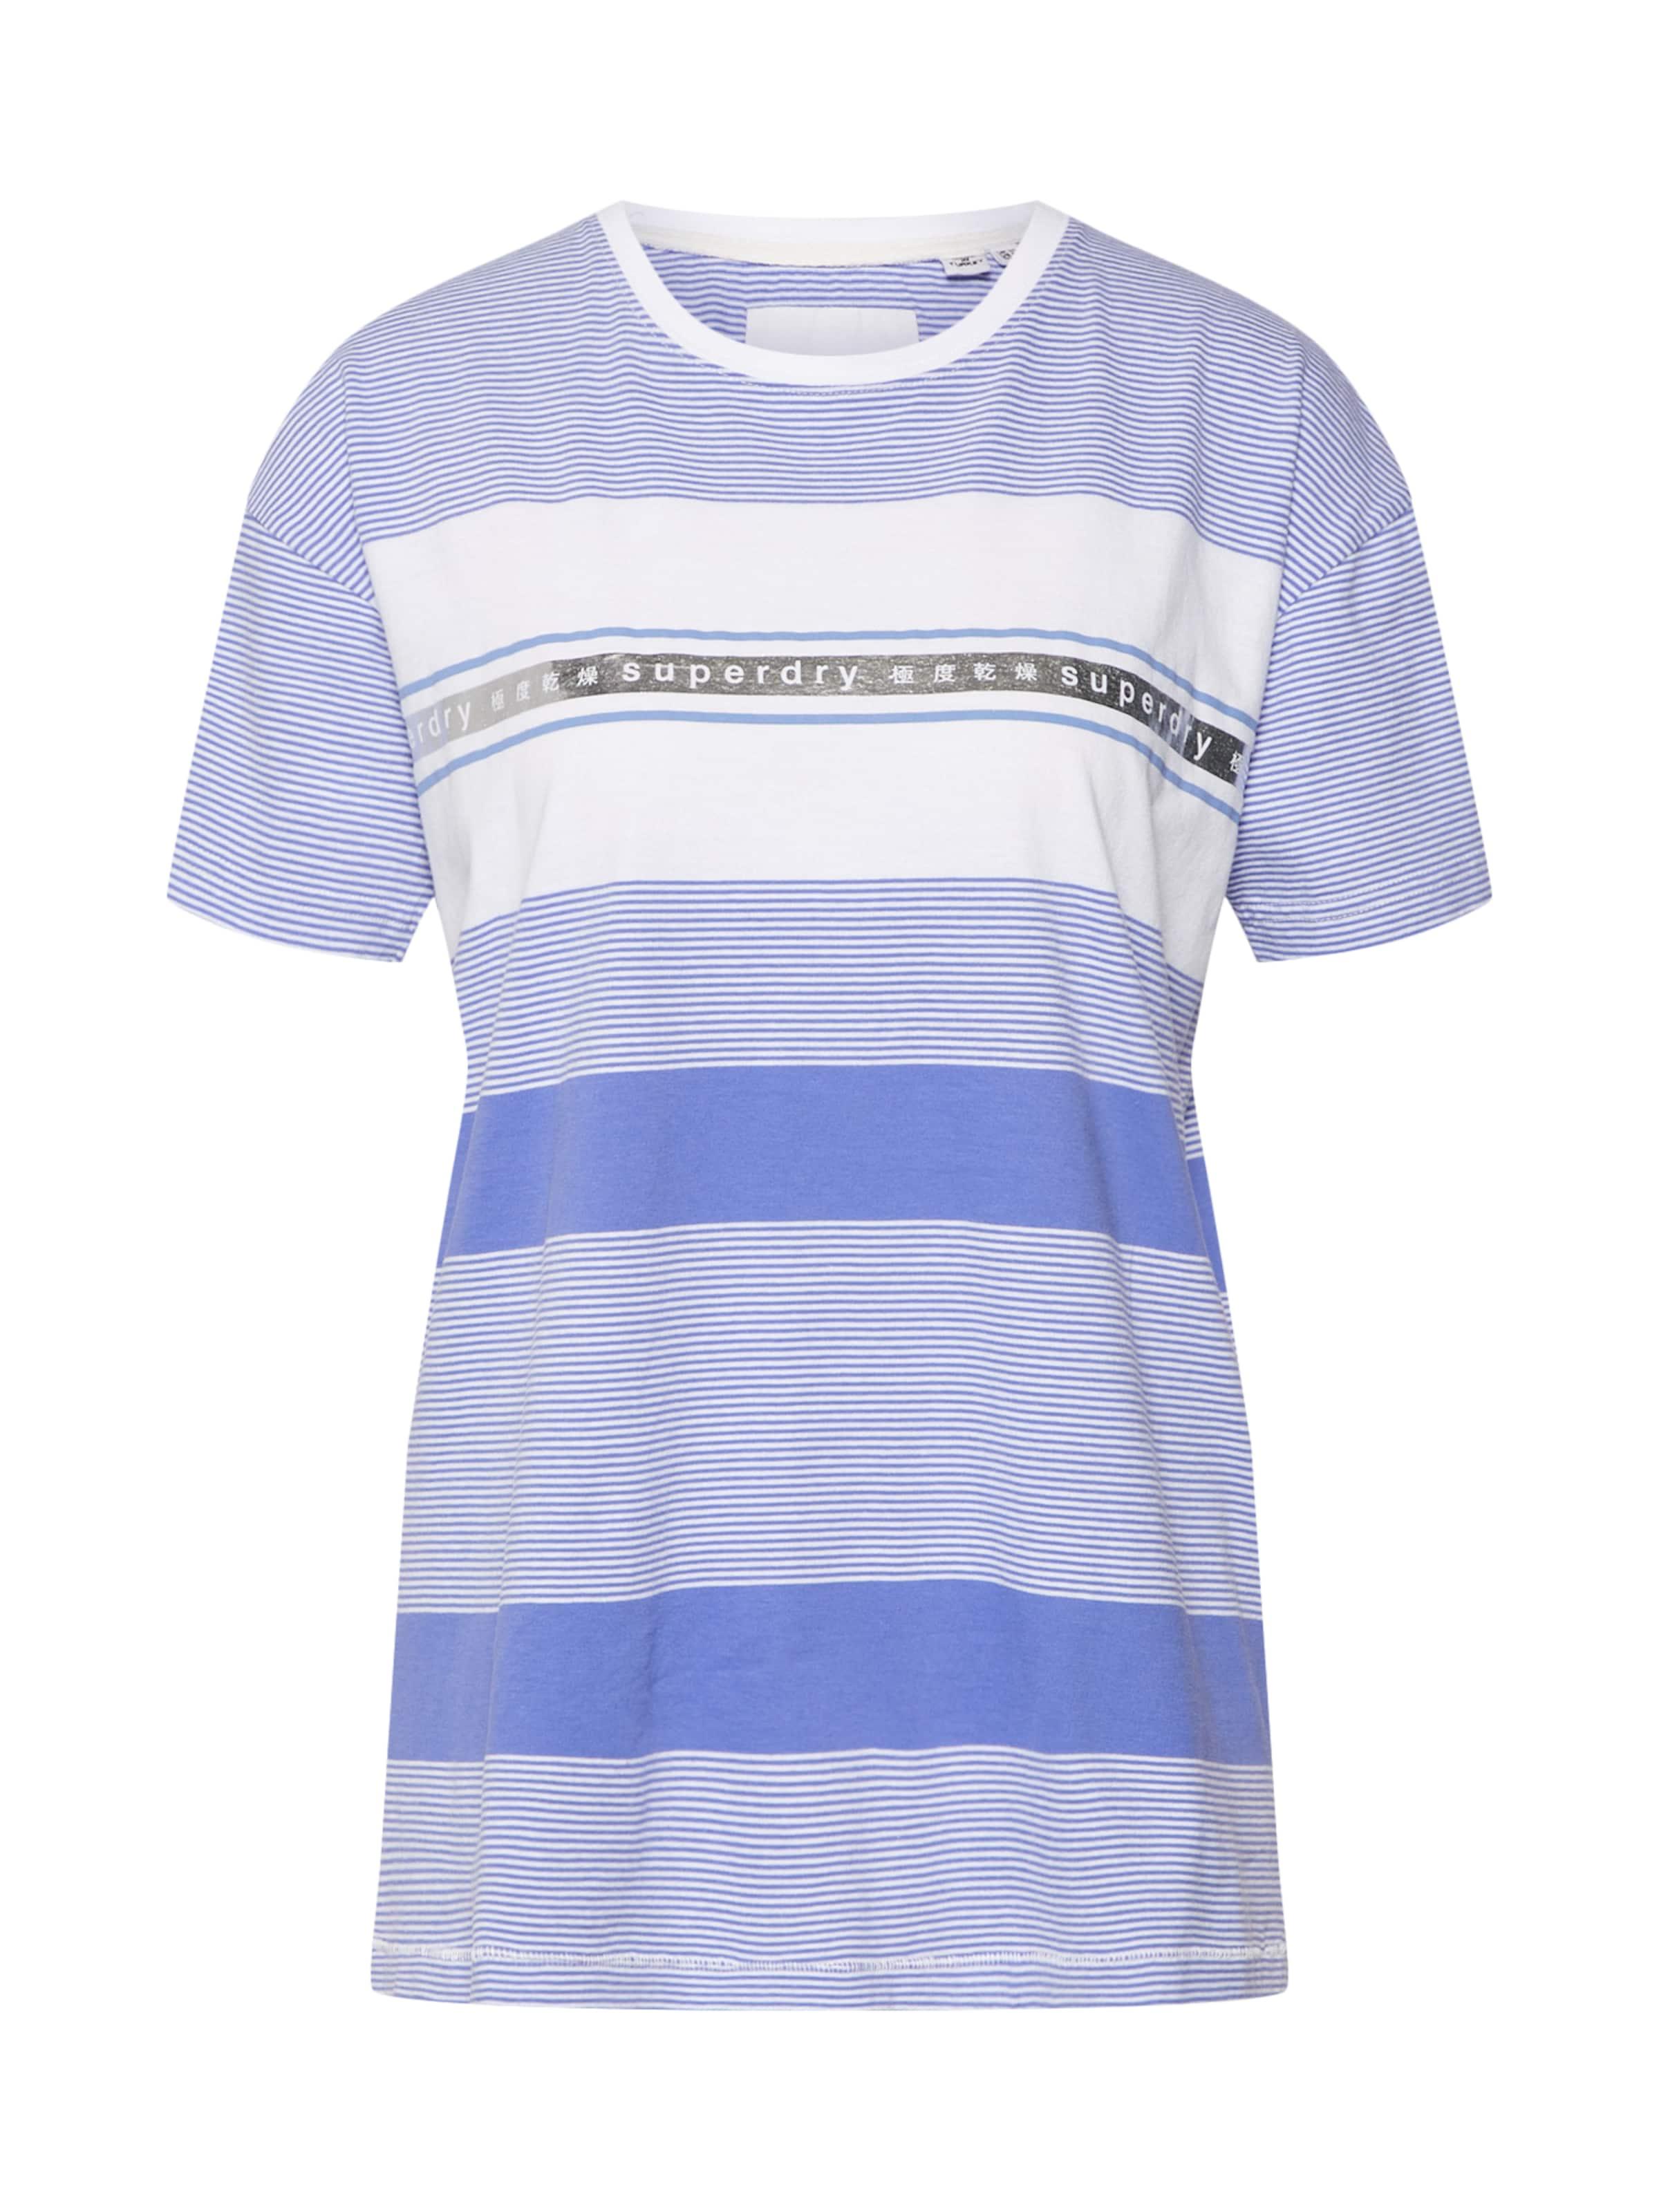 'tape Portland' BleuBlanc shirt Stripe En Superdry T ukXTPZOi